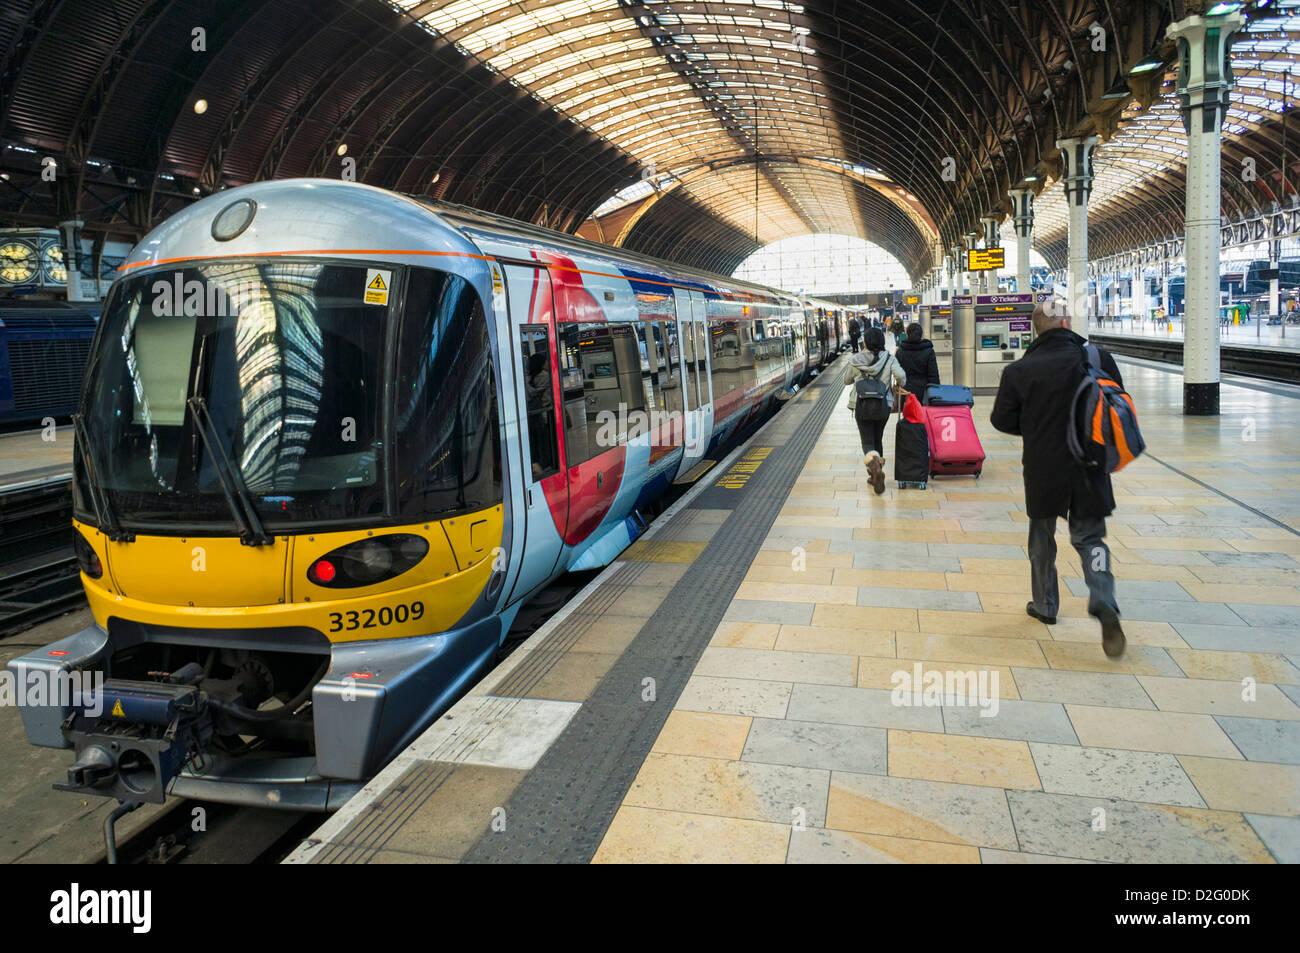 Train platform at Paddington station, London, train station, UK with people boarding a train - Stock Image